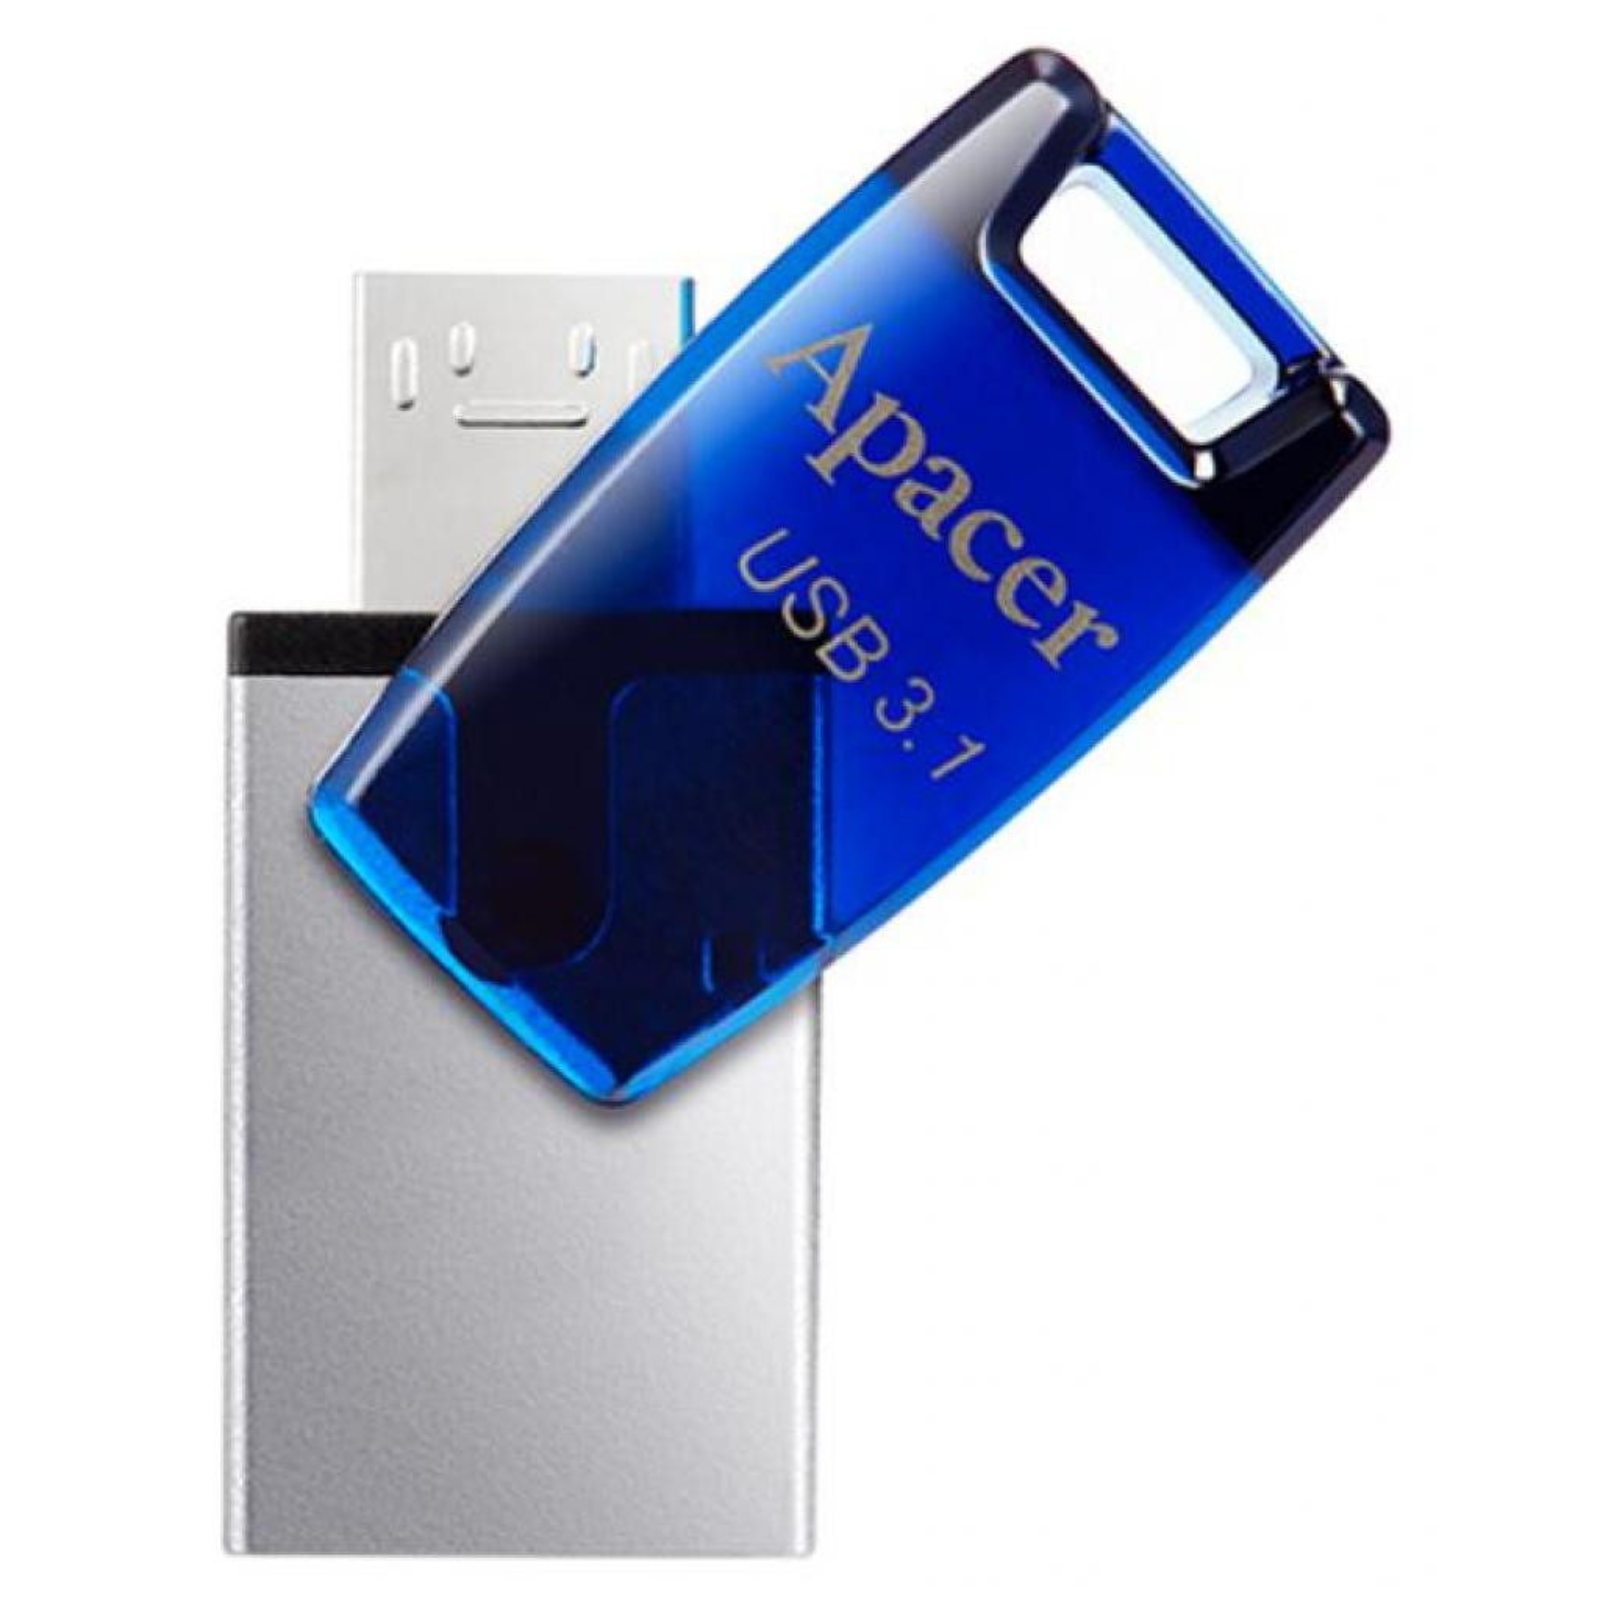 USB флеш накопитель Apacer 8GB AH179 Blue USB 3.1 OTG (AP8GAH179U-1) изображение 3